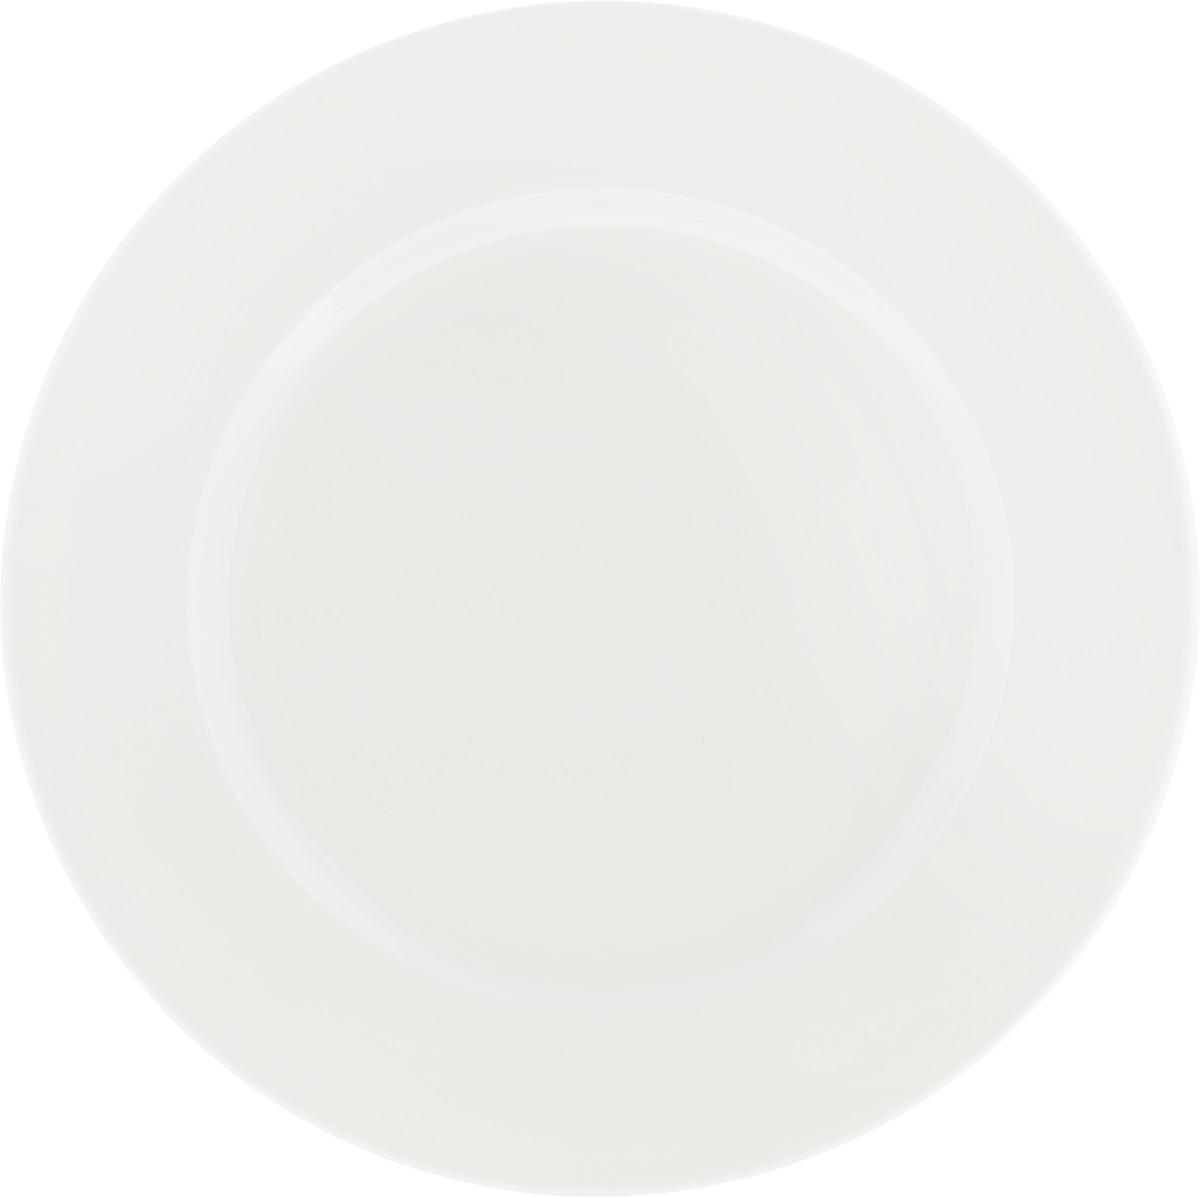 Тарелка Ariane Прайм, диаметр 29 см